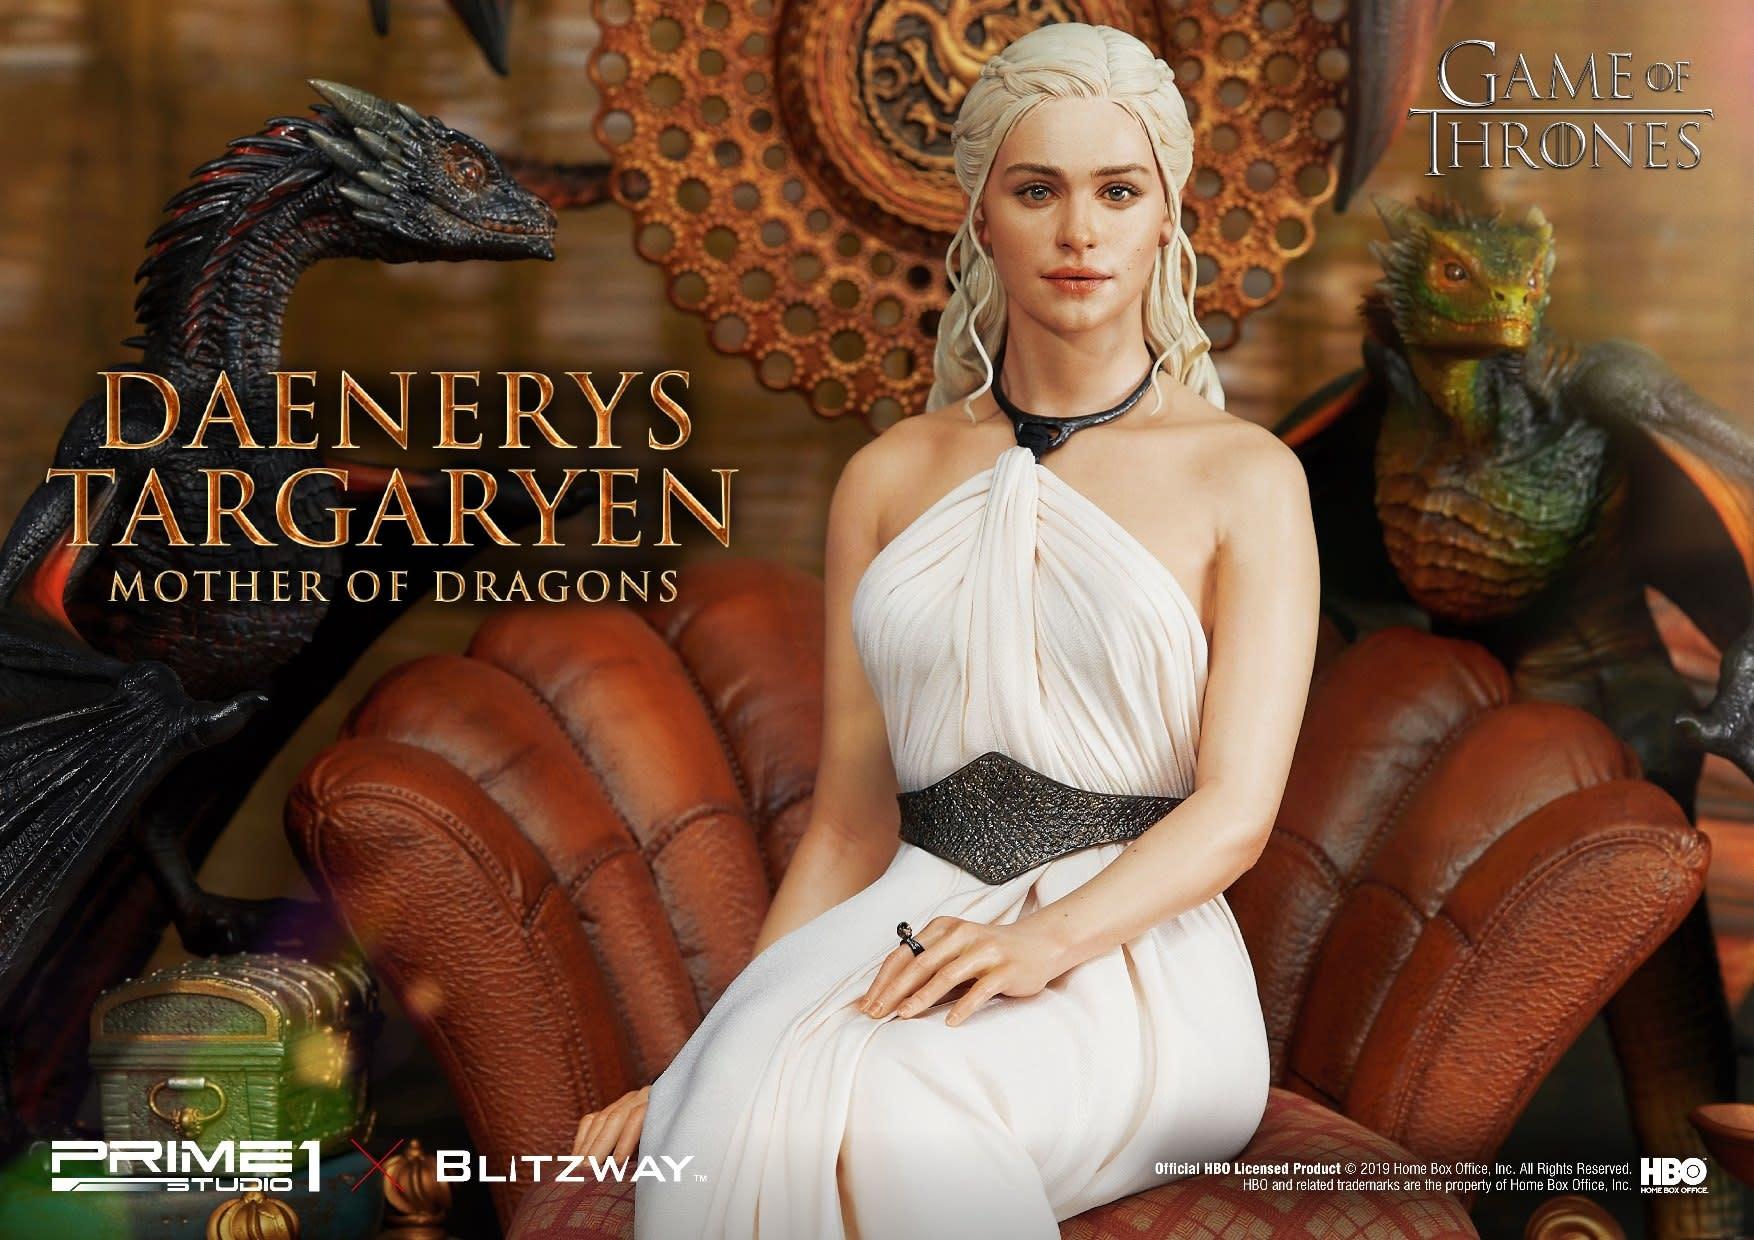 Prime 1 Studio Pre order: Game of Thrones: Daenerys Targaryen - Mother of Dragons Statue